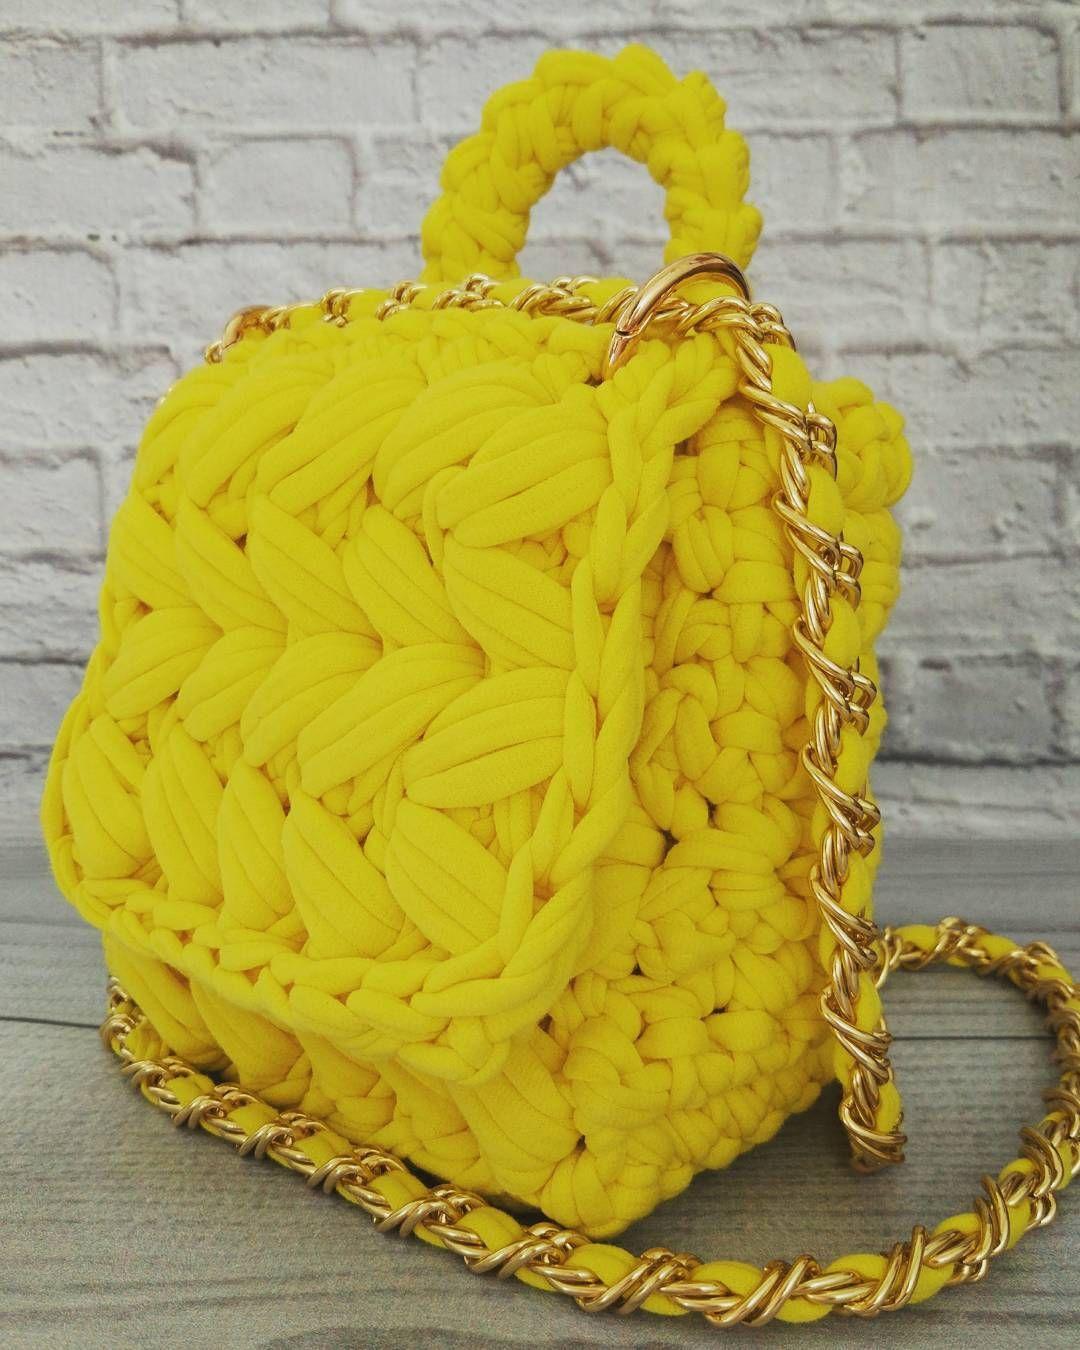 f146bc3d164d сумка из трикотажной пряжи крючком схема | Сумки | Wool blanket ...